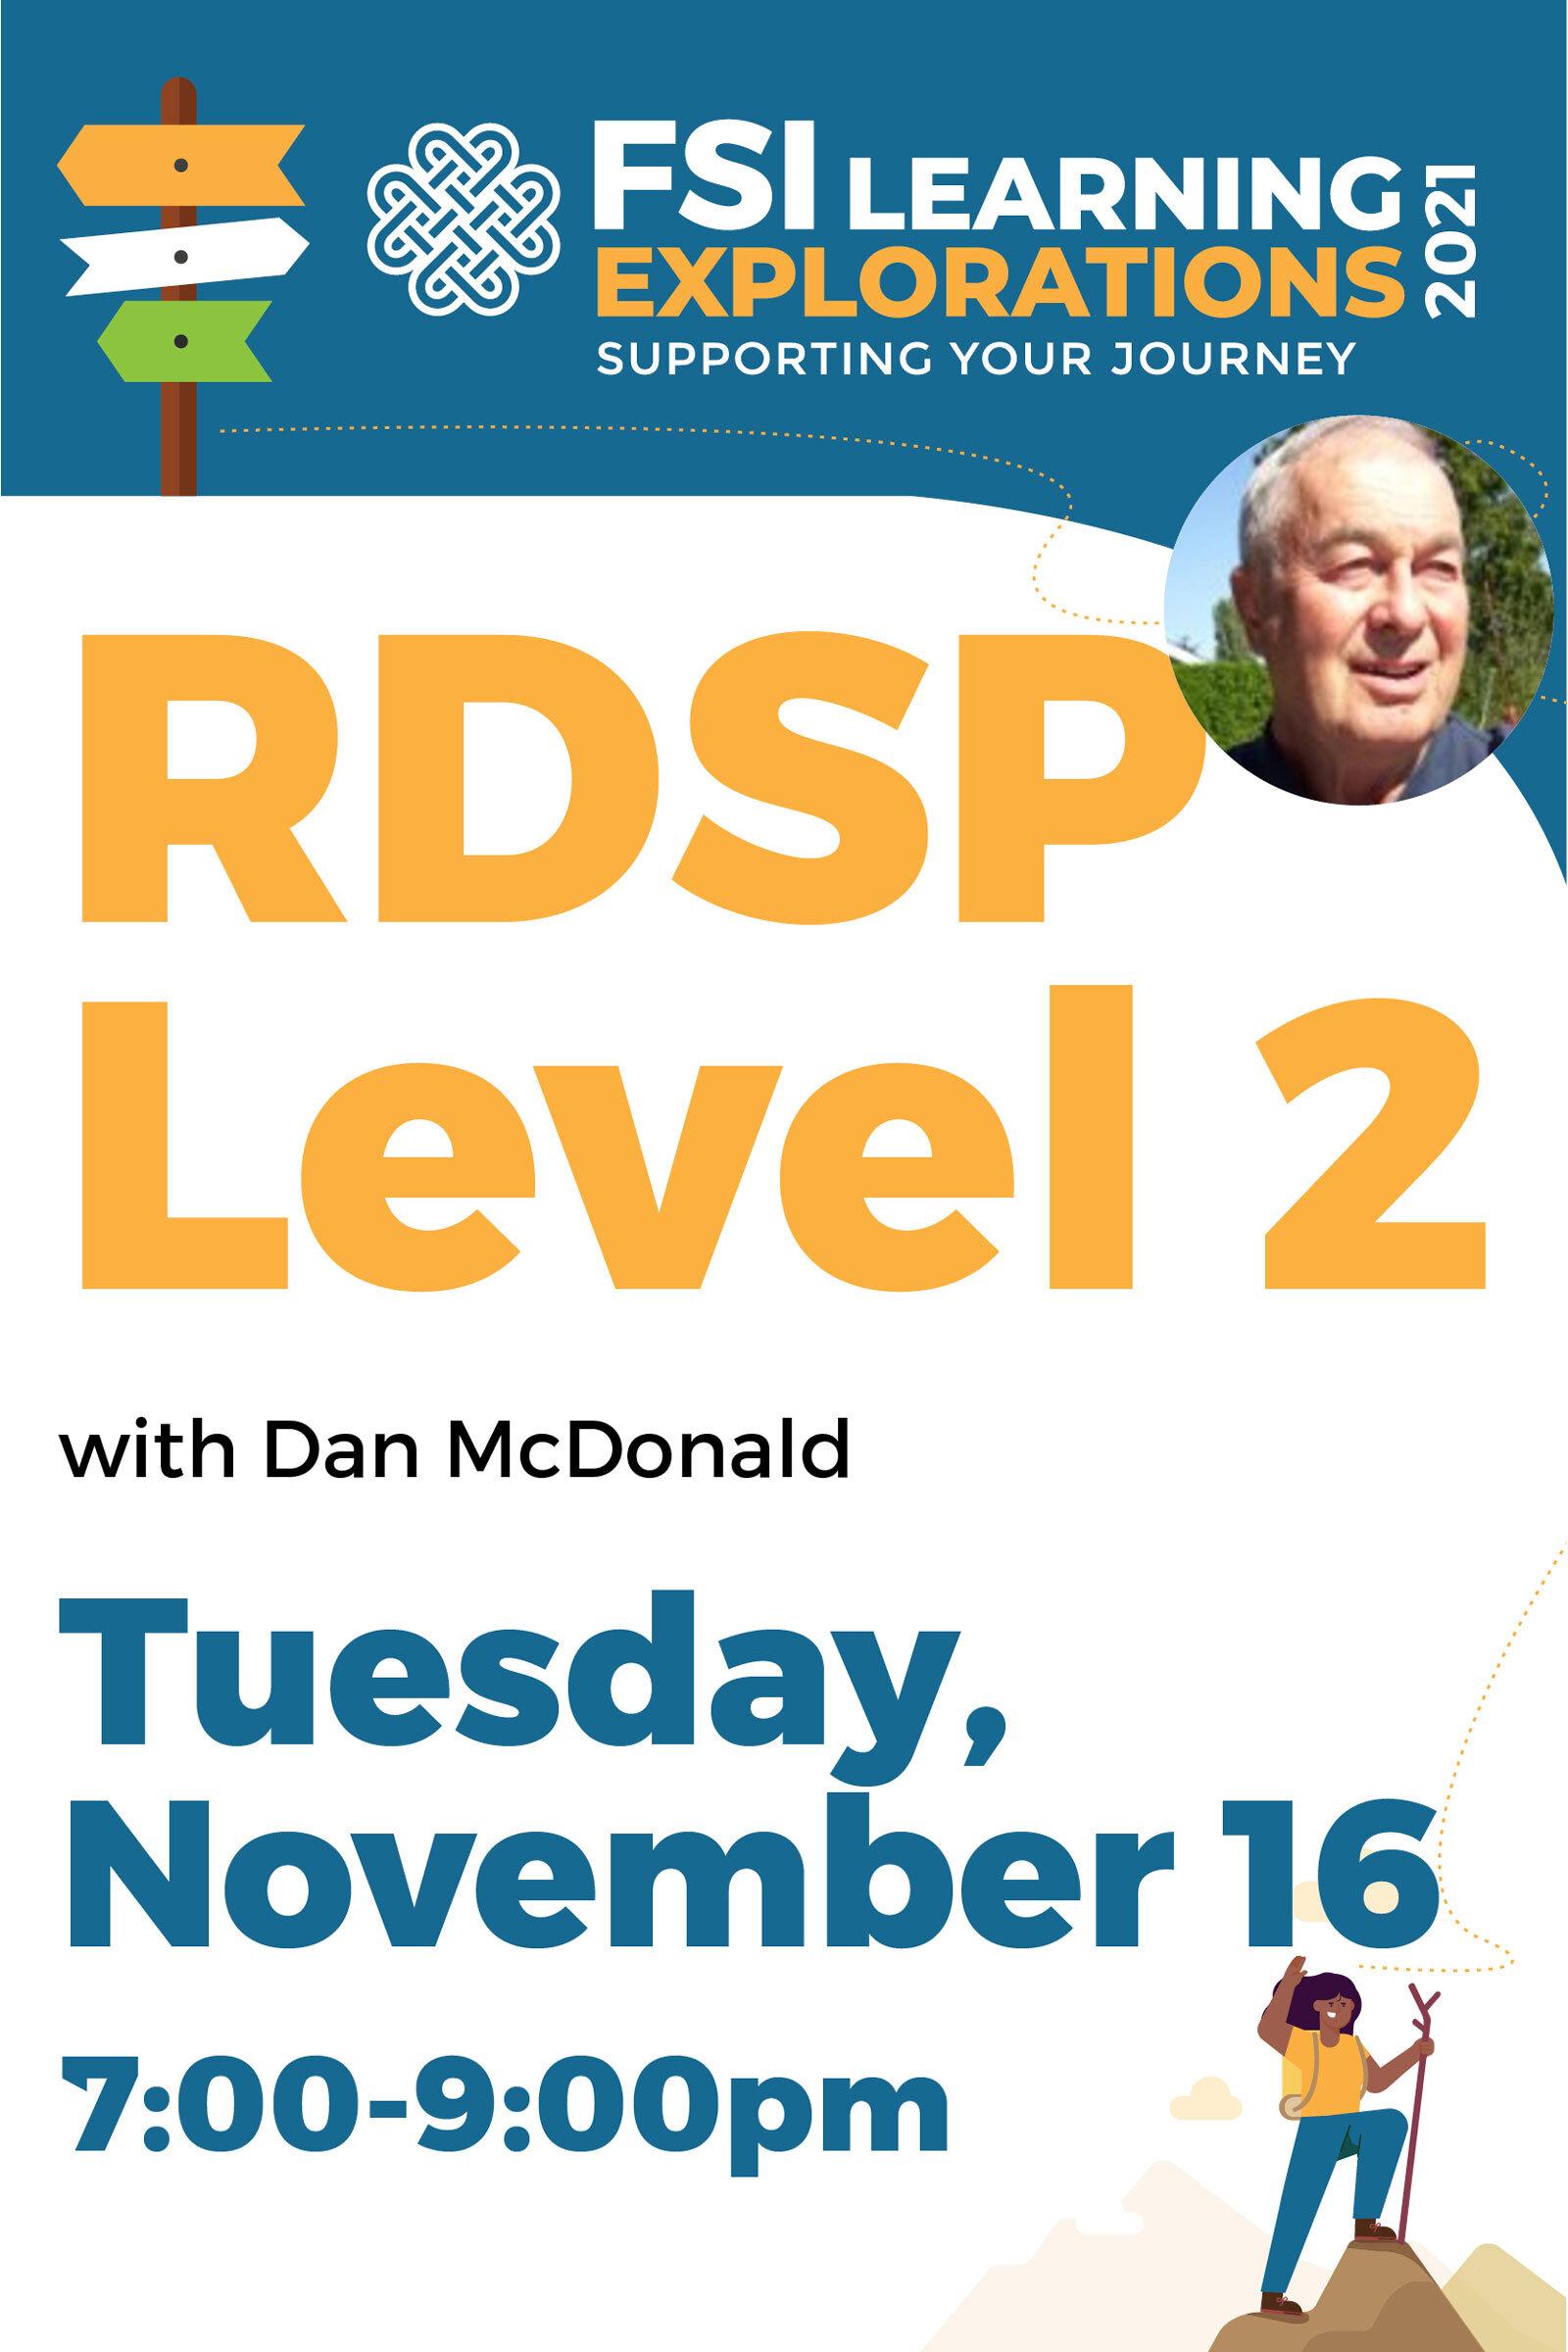 FSI Learning Explorations ~ RDSP Level 2